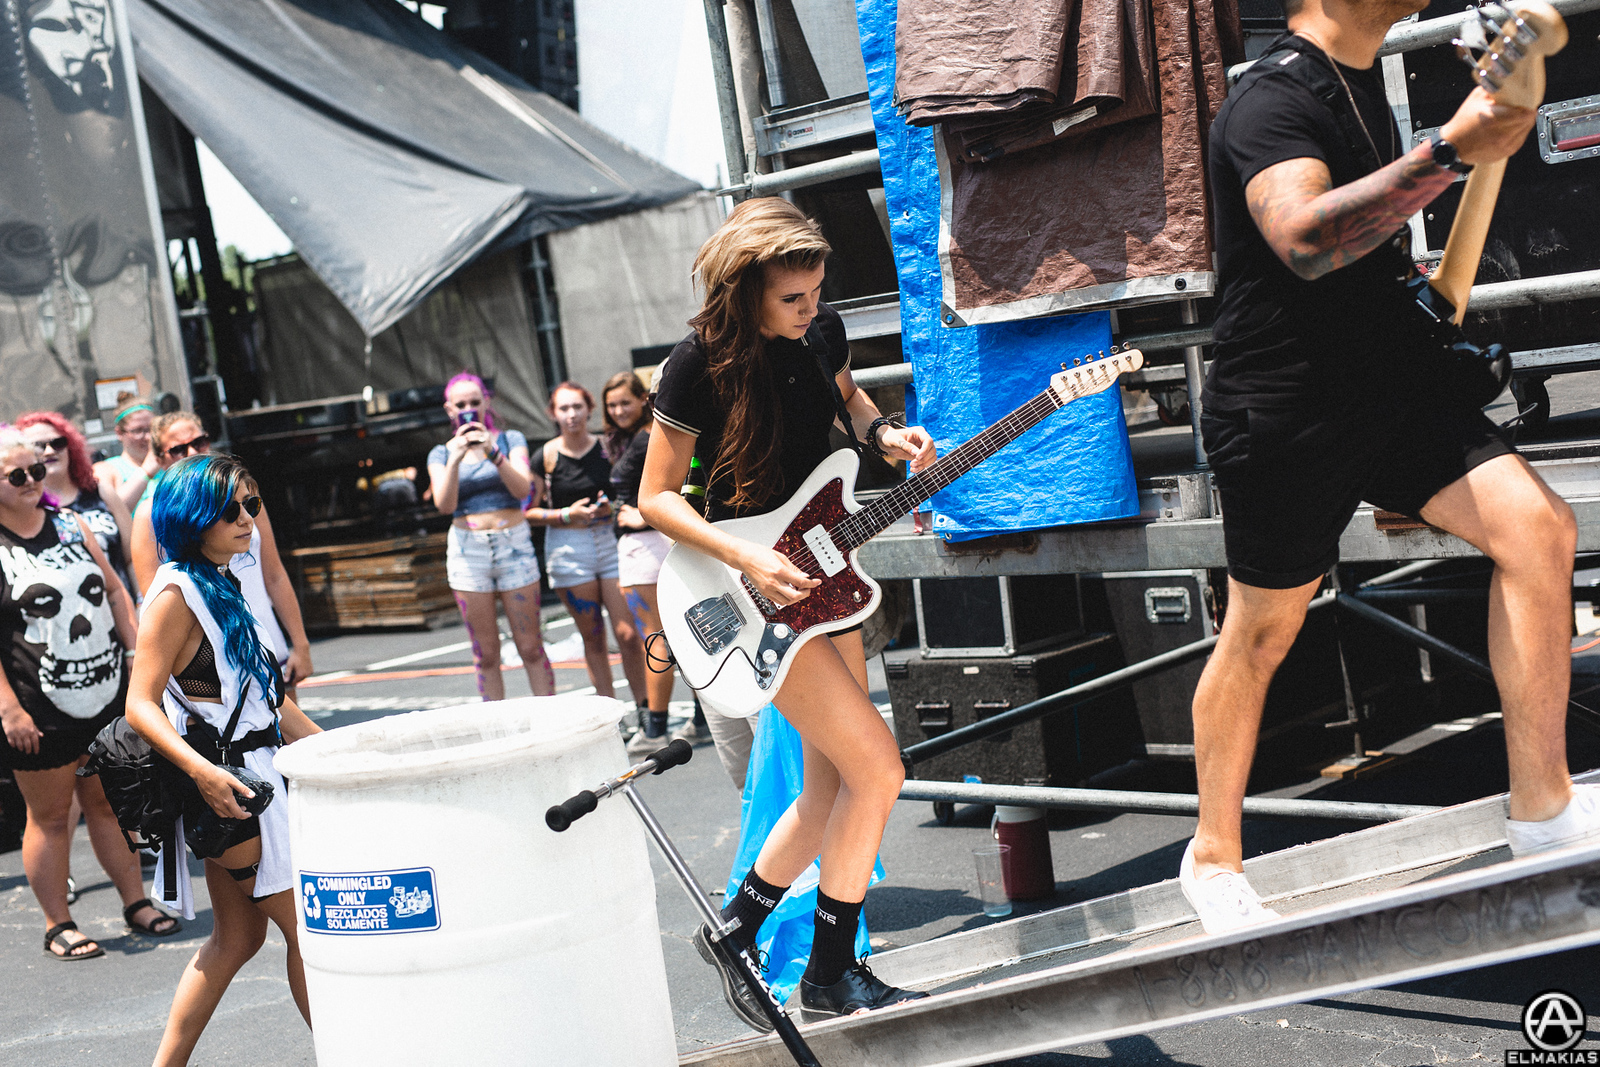 PVRIS before their set at Vans Warped Tour 2015 by Adam Elmakias